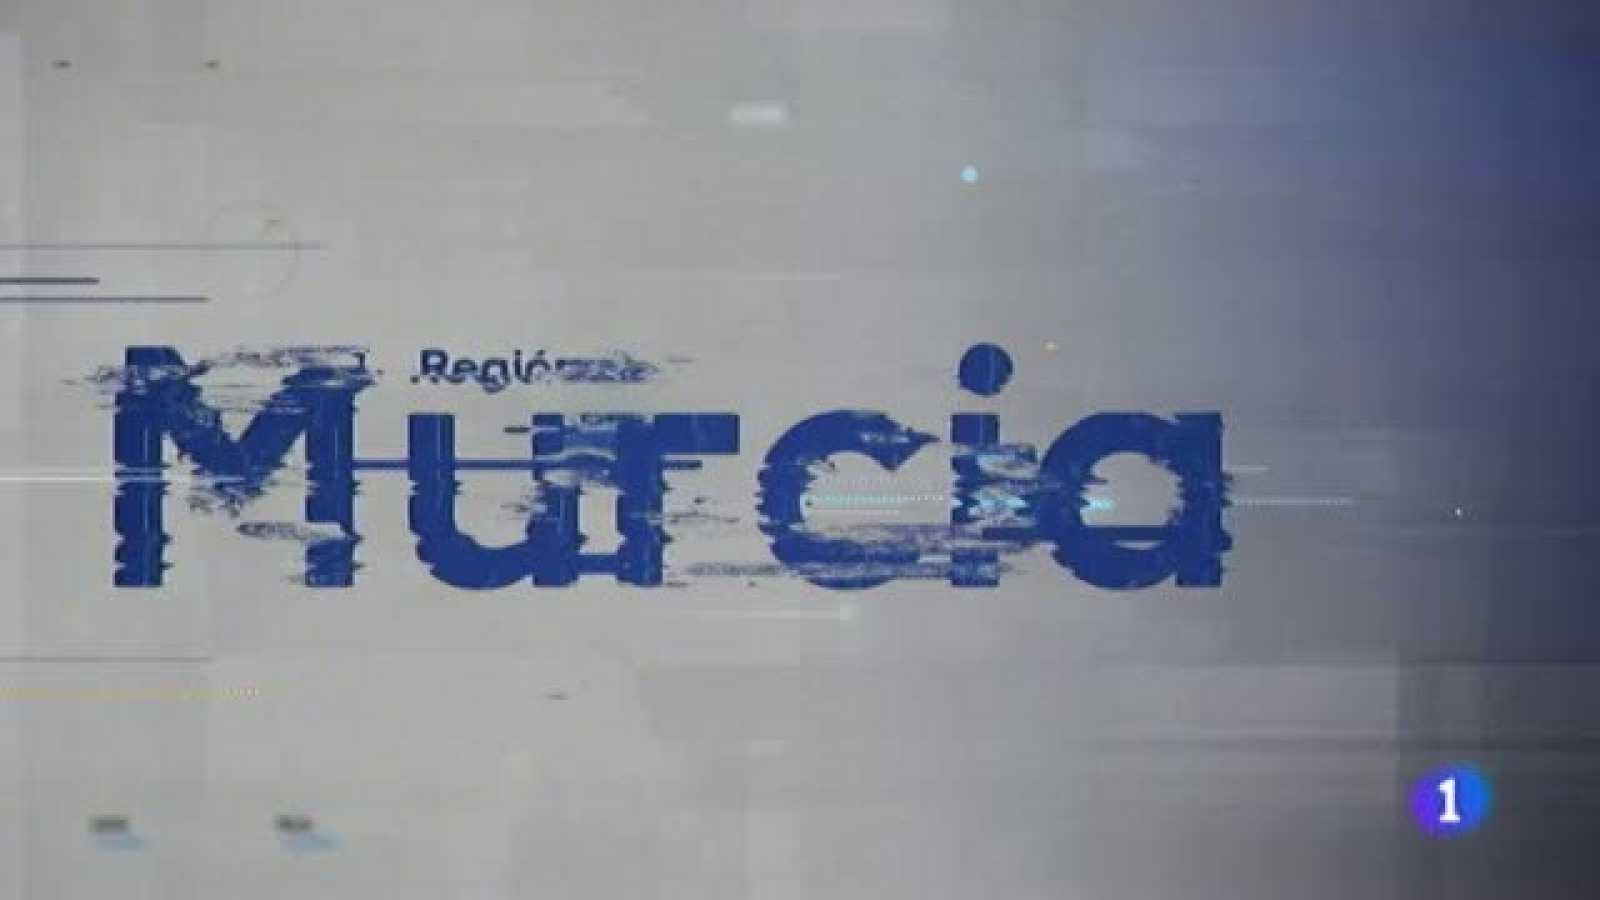 Noticias Murcia - 18/05/2021